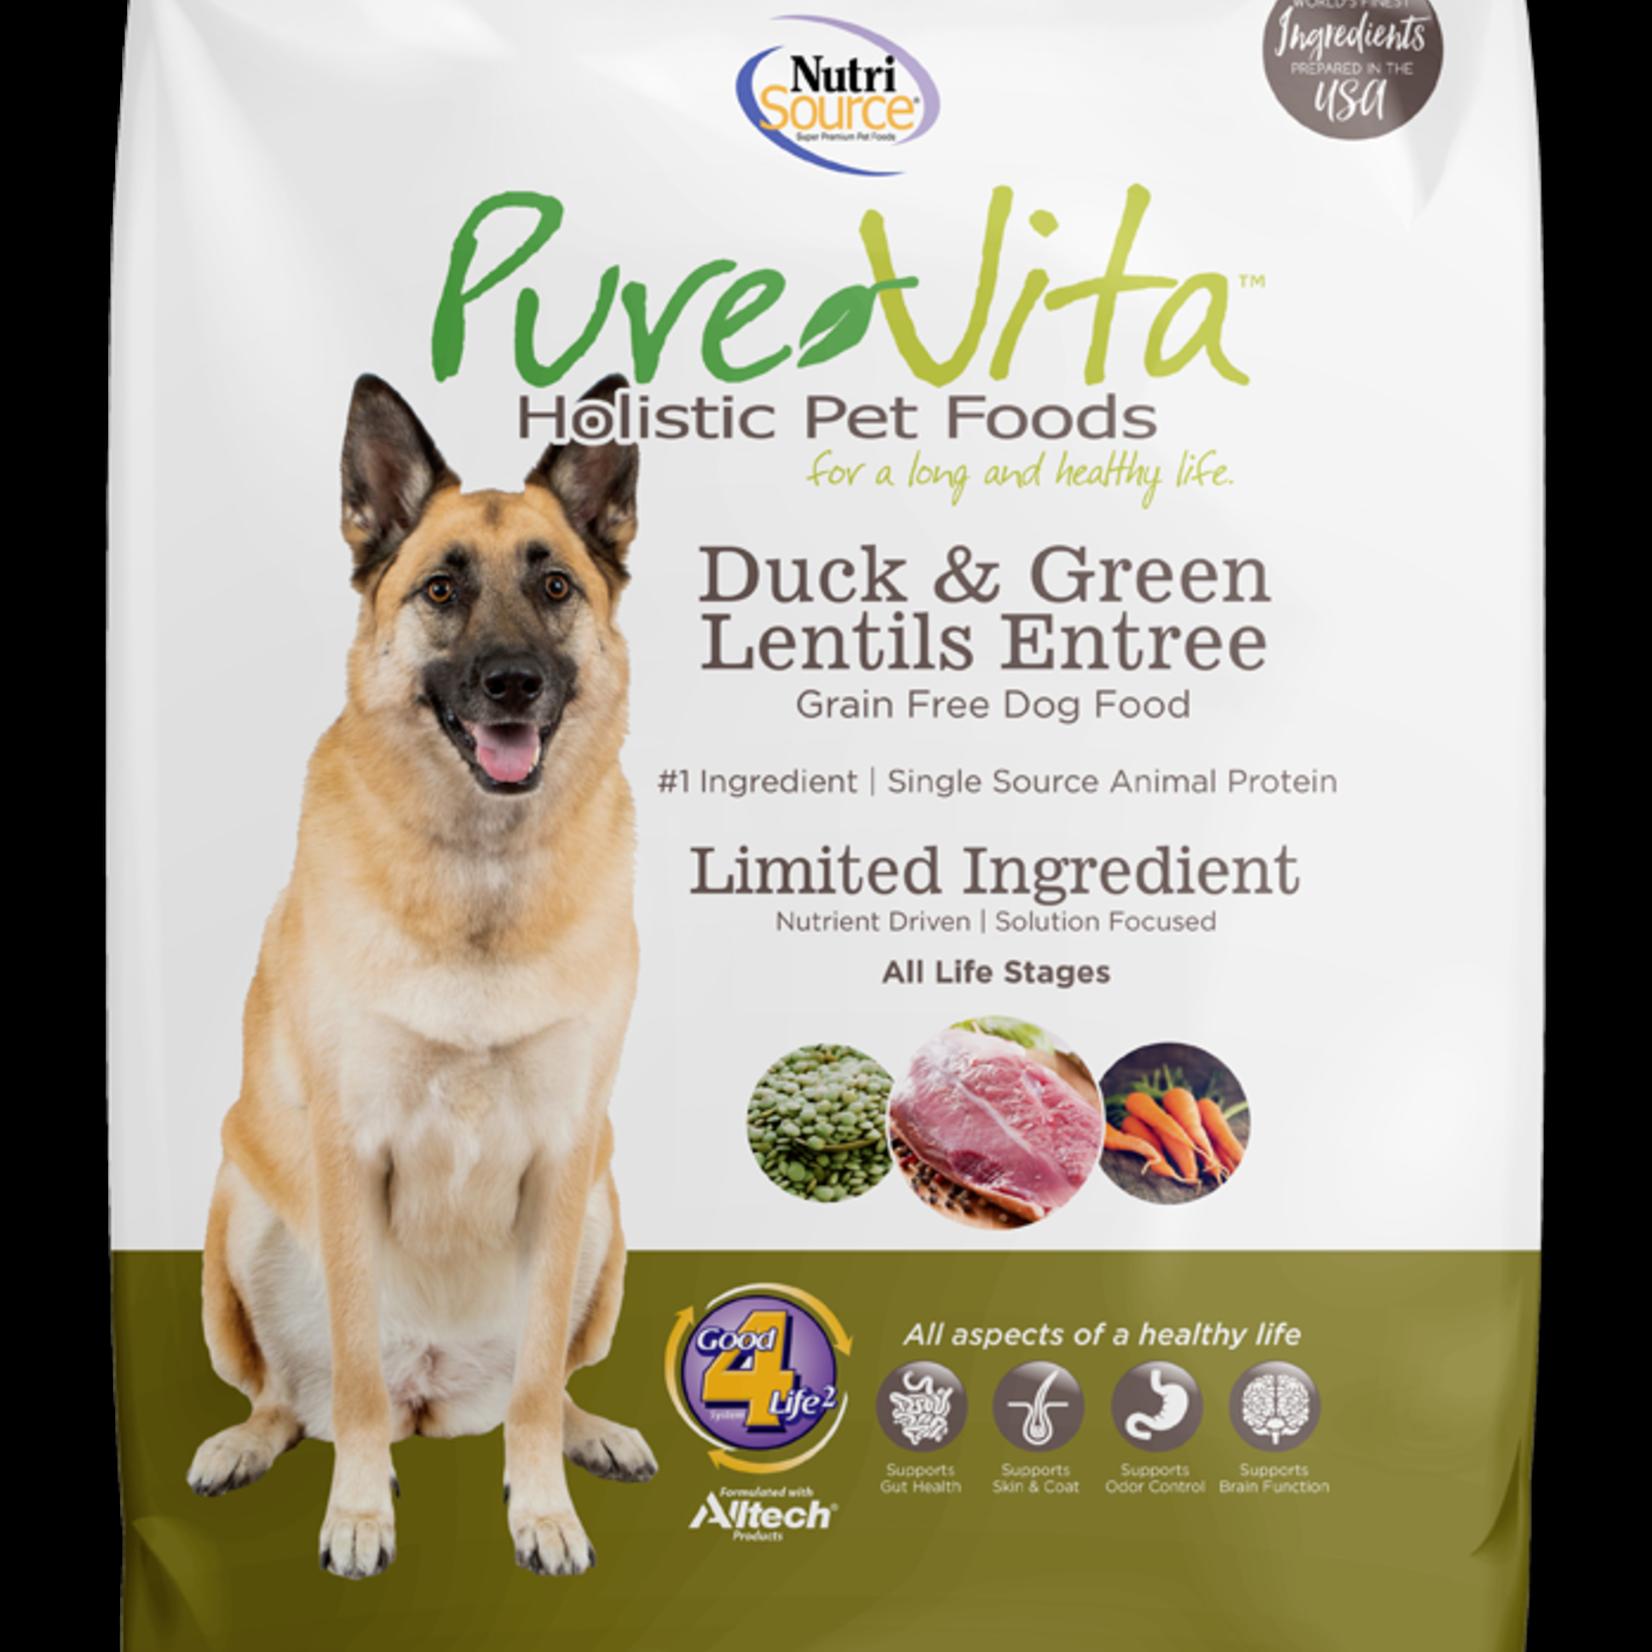 PureVita Pure Vita Dog GF Duck & Green Lentils 5#